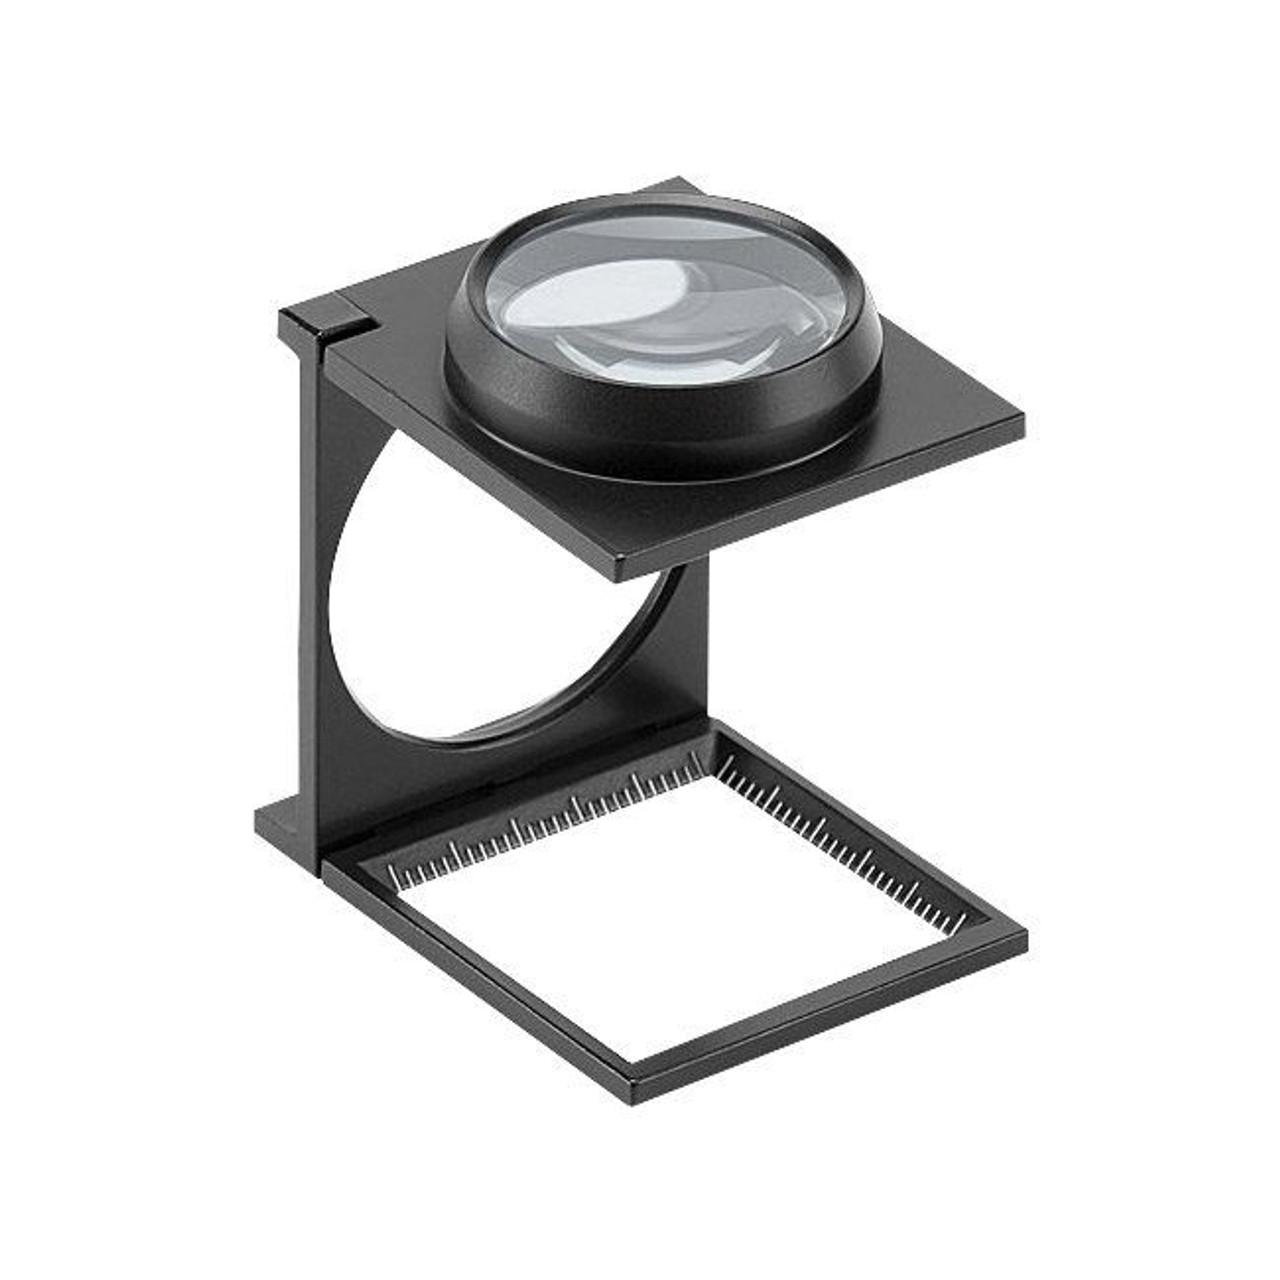 Peak 3X 52mm Measuring Magnifier Linen Tester 2003 WA3 (PK-2003-WA3) (view)